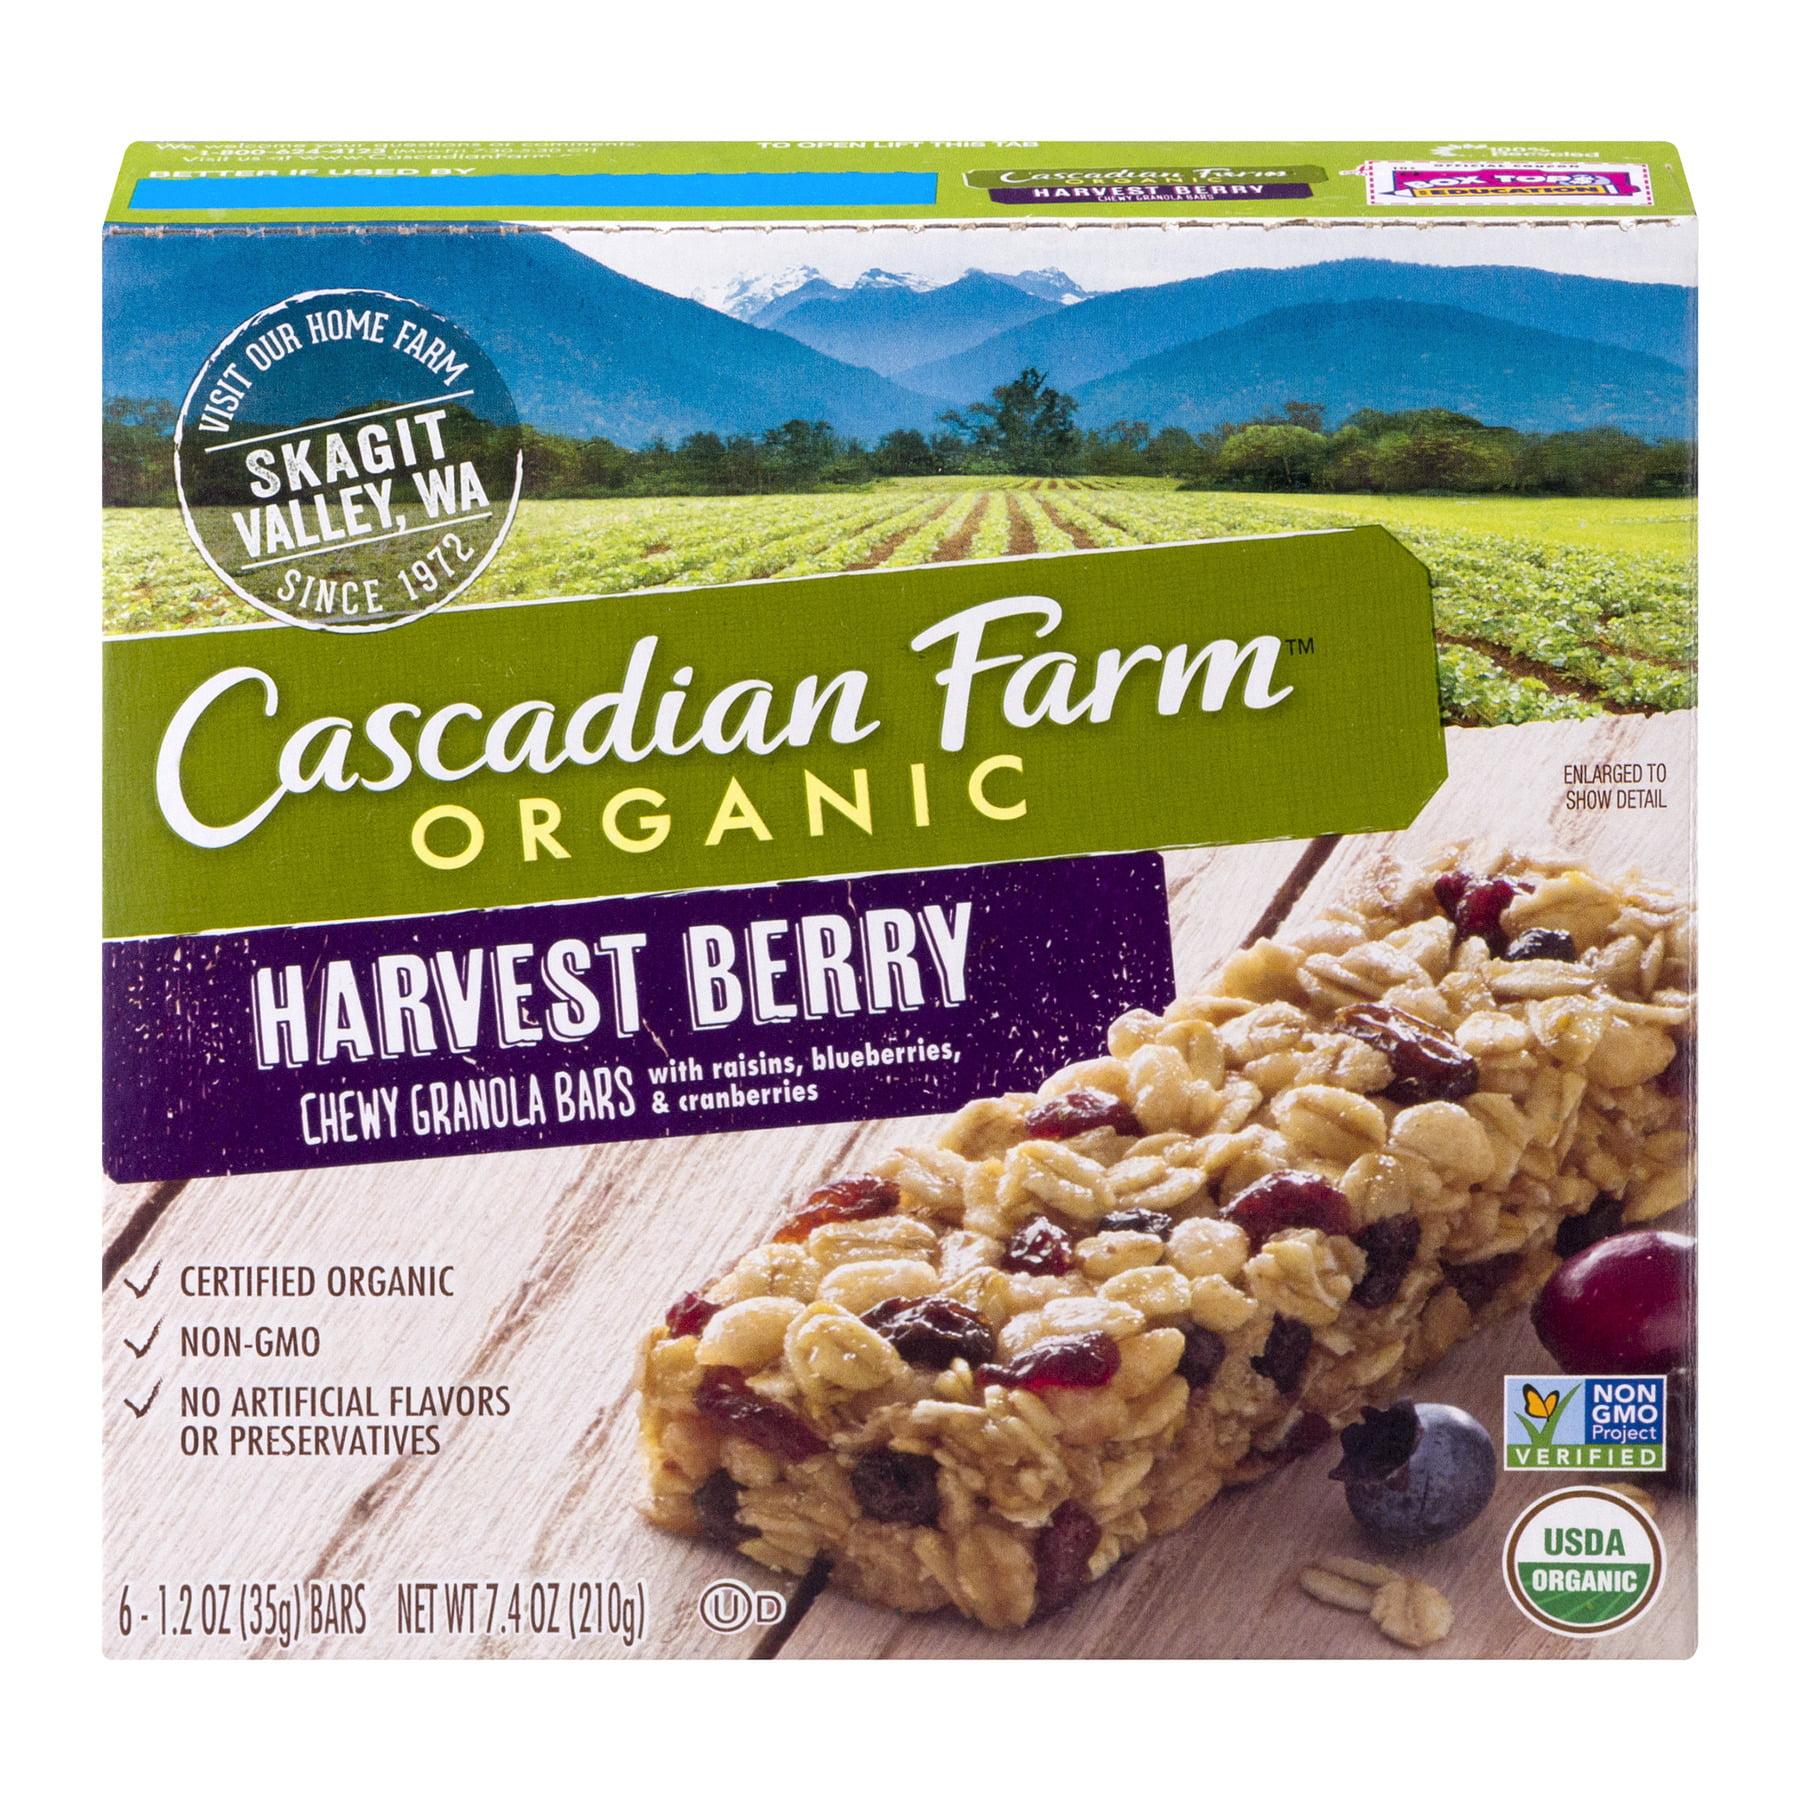 (2 Pack) Cascadian Farm Organic Granola Bars Harvest Berry Chewy Granola 6 Ct